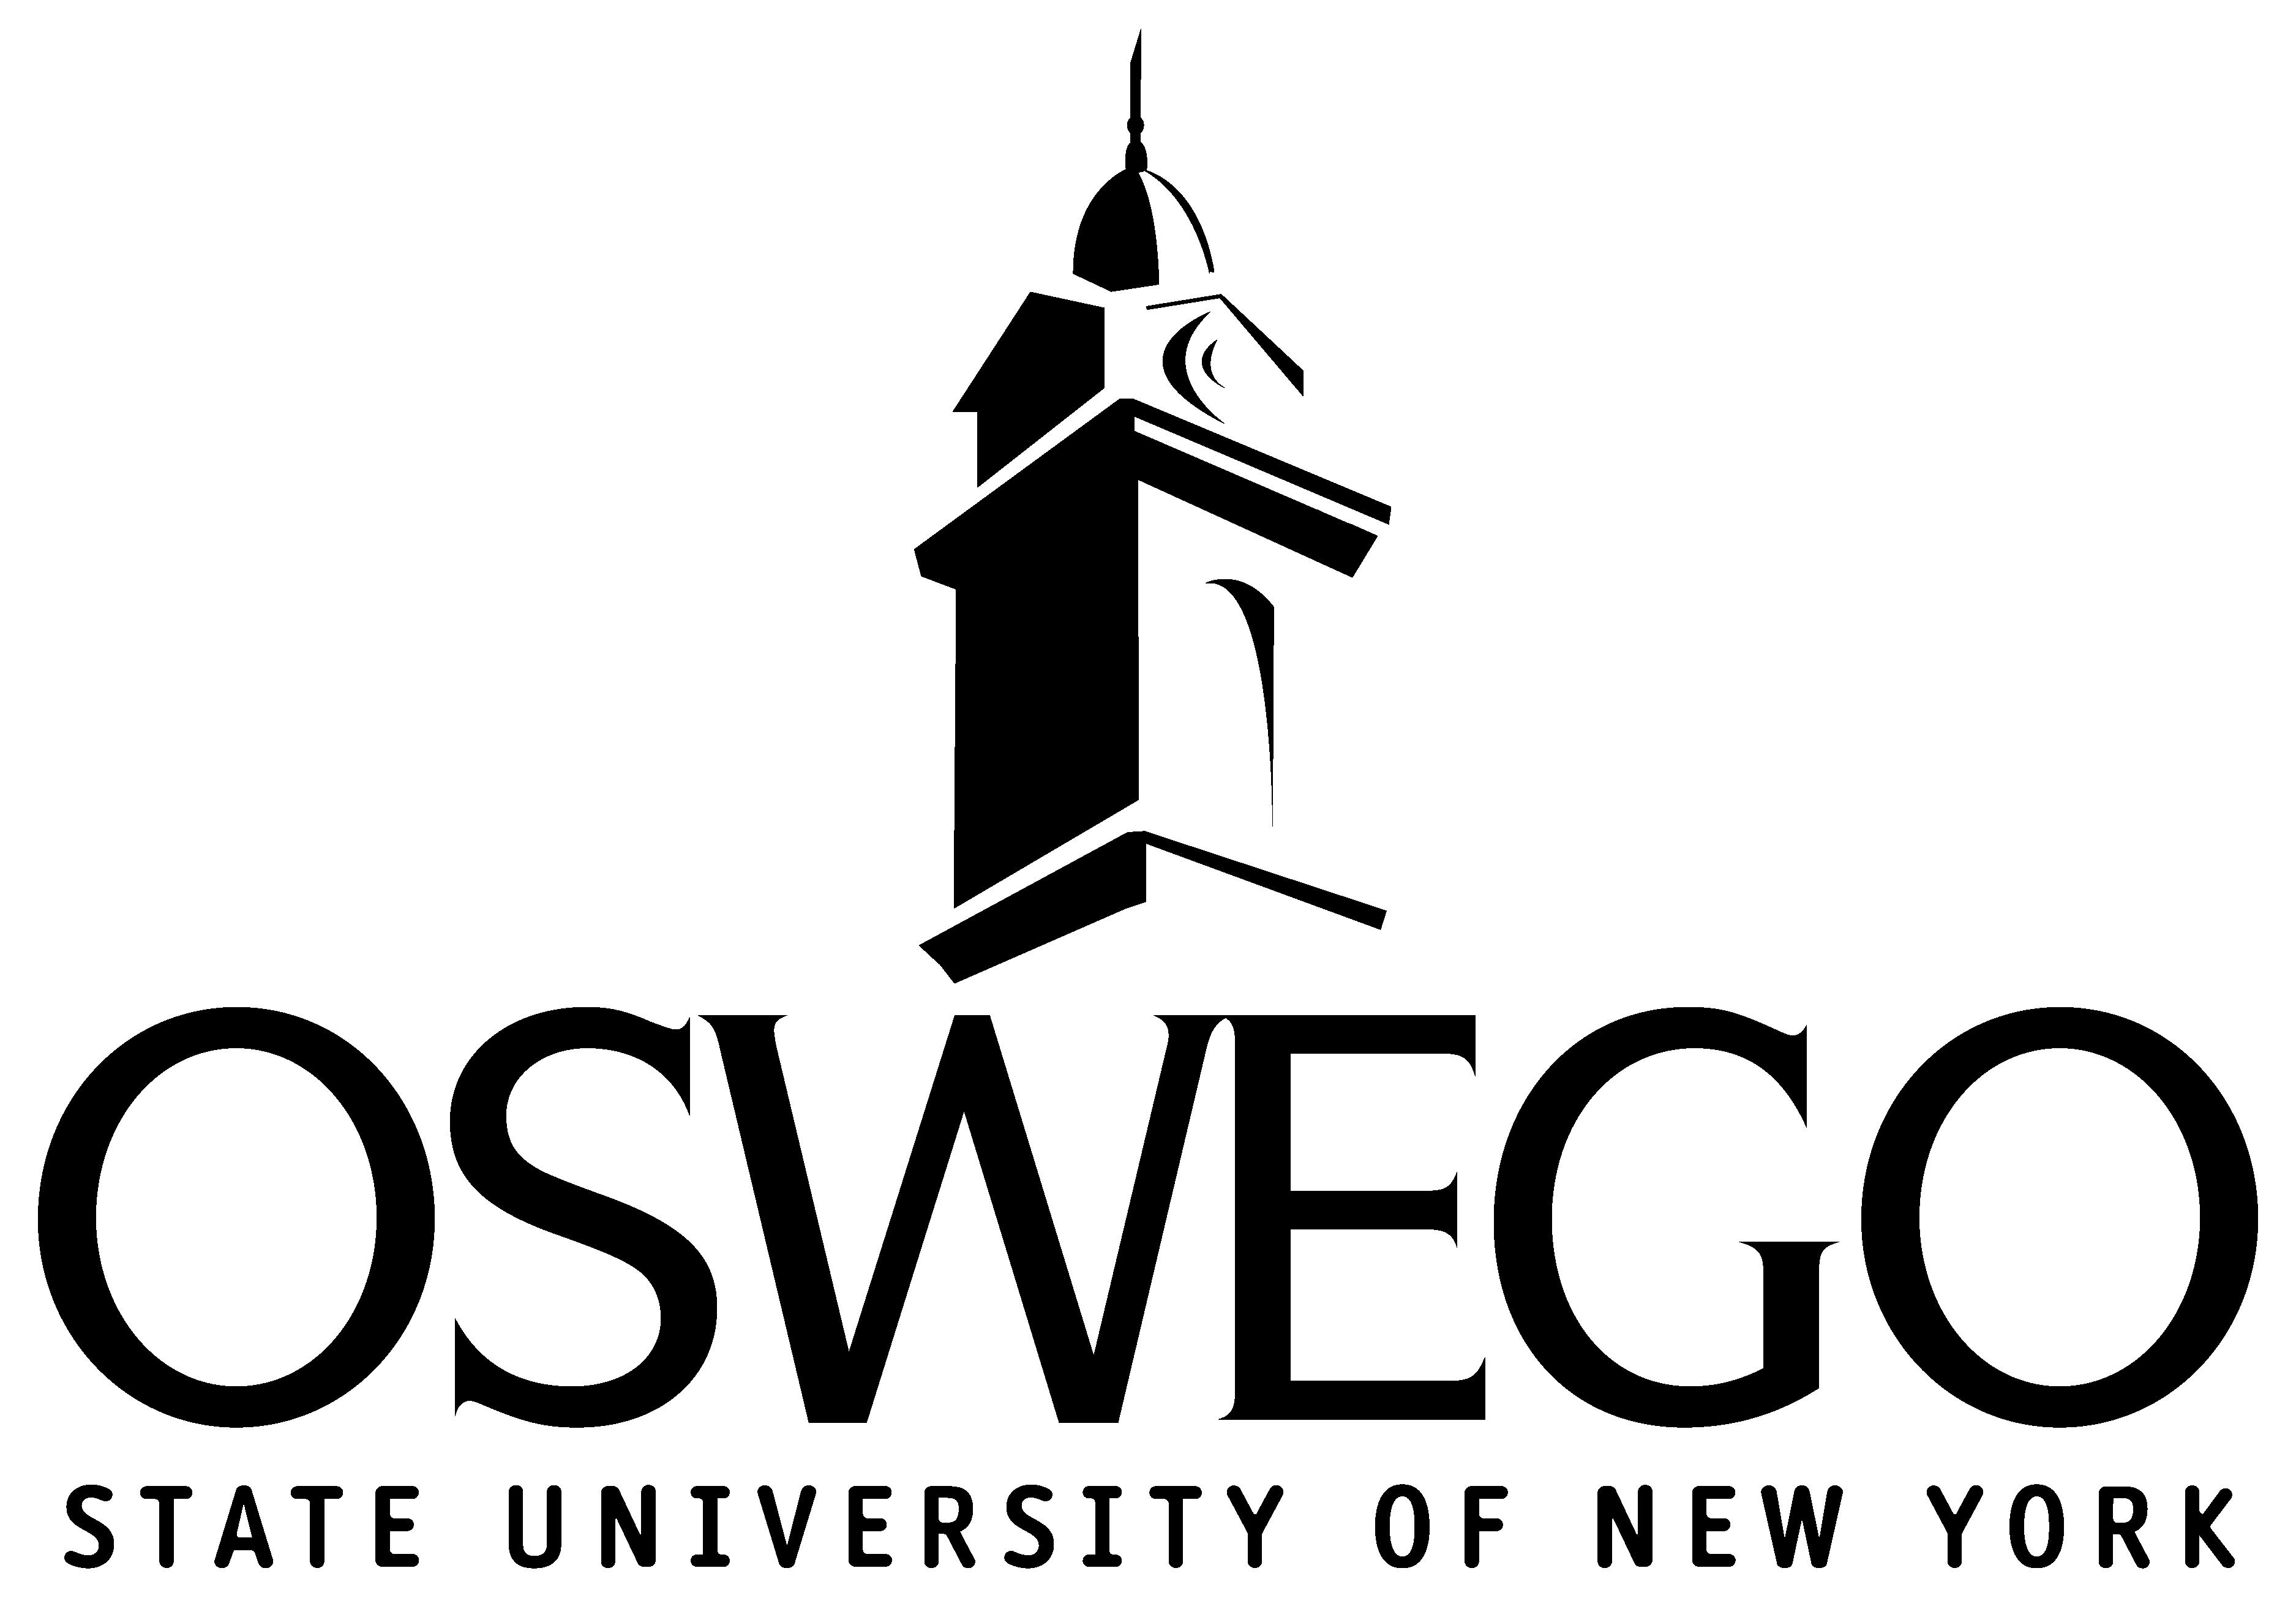 State University of New York at Oswego logo